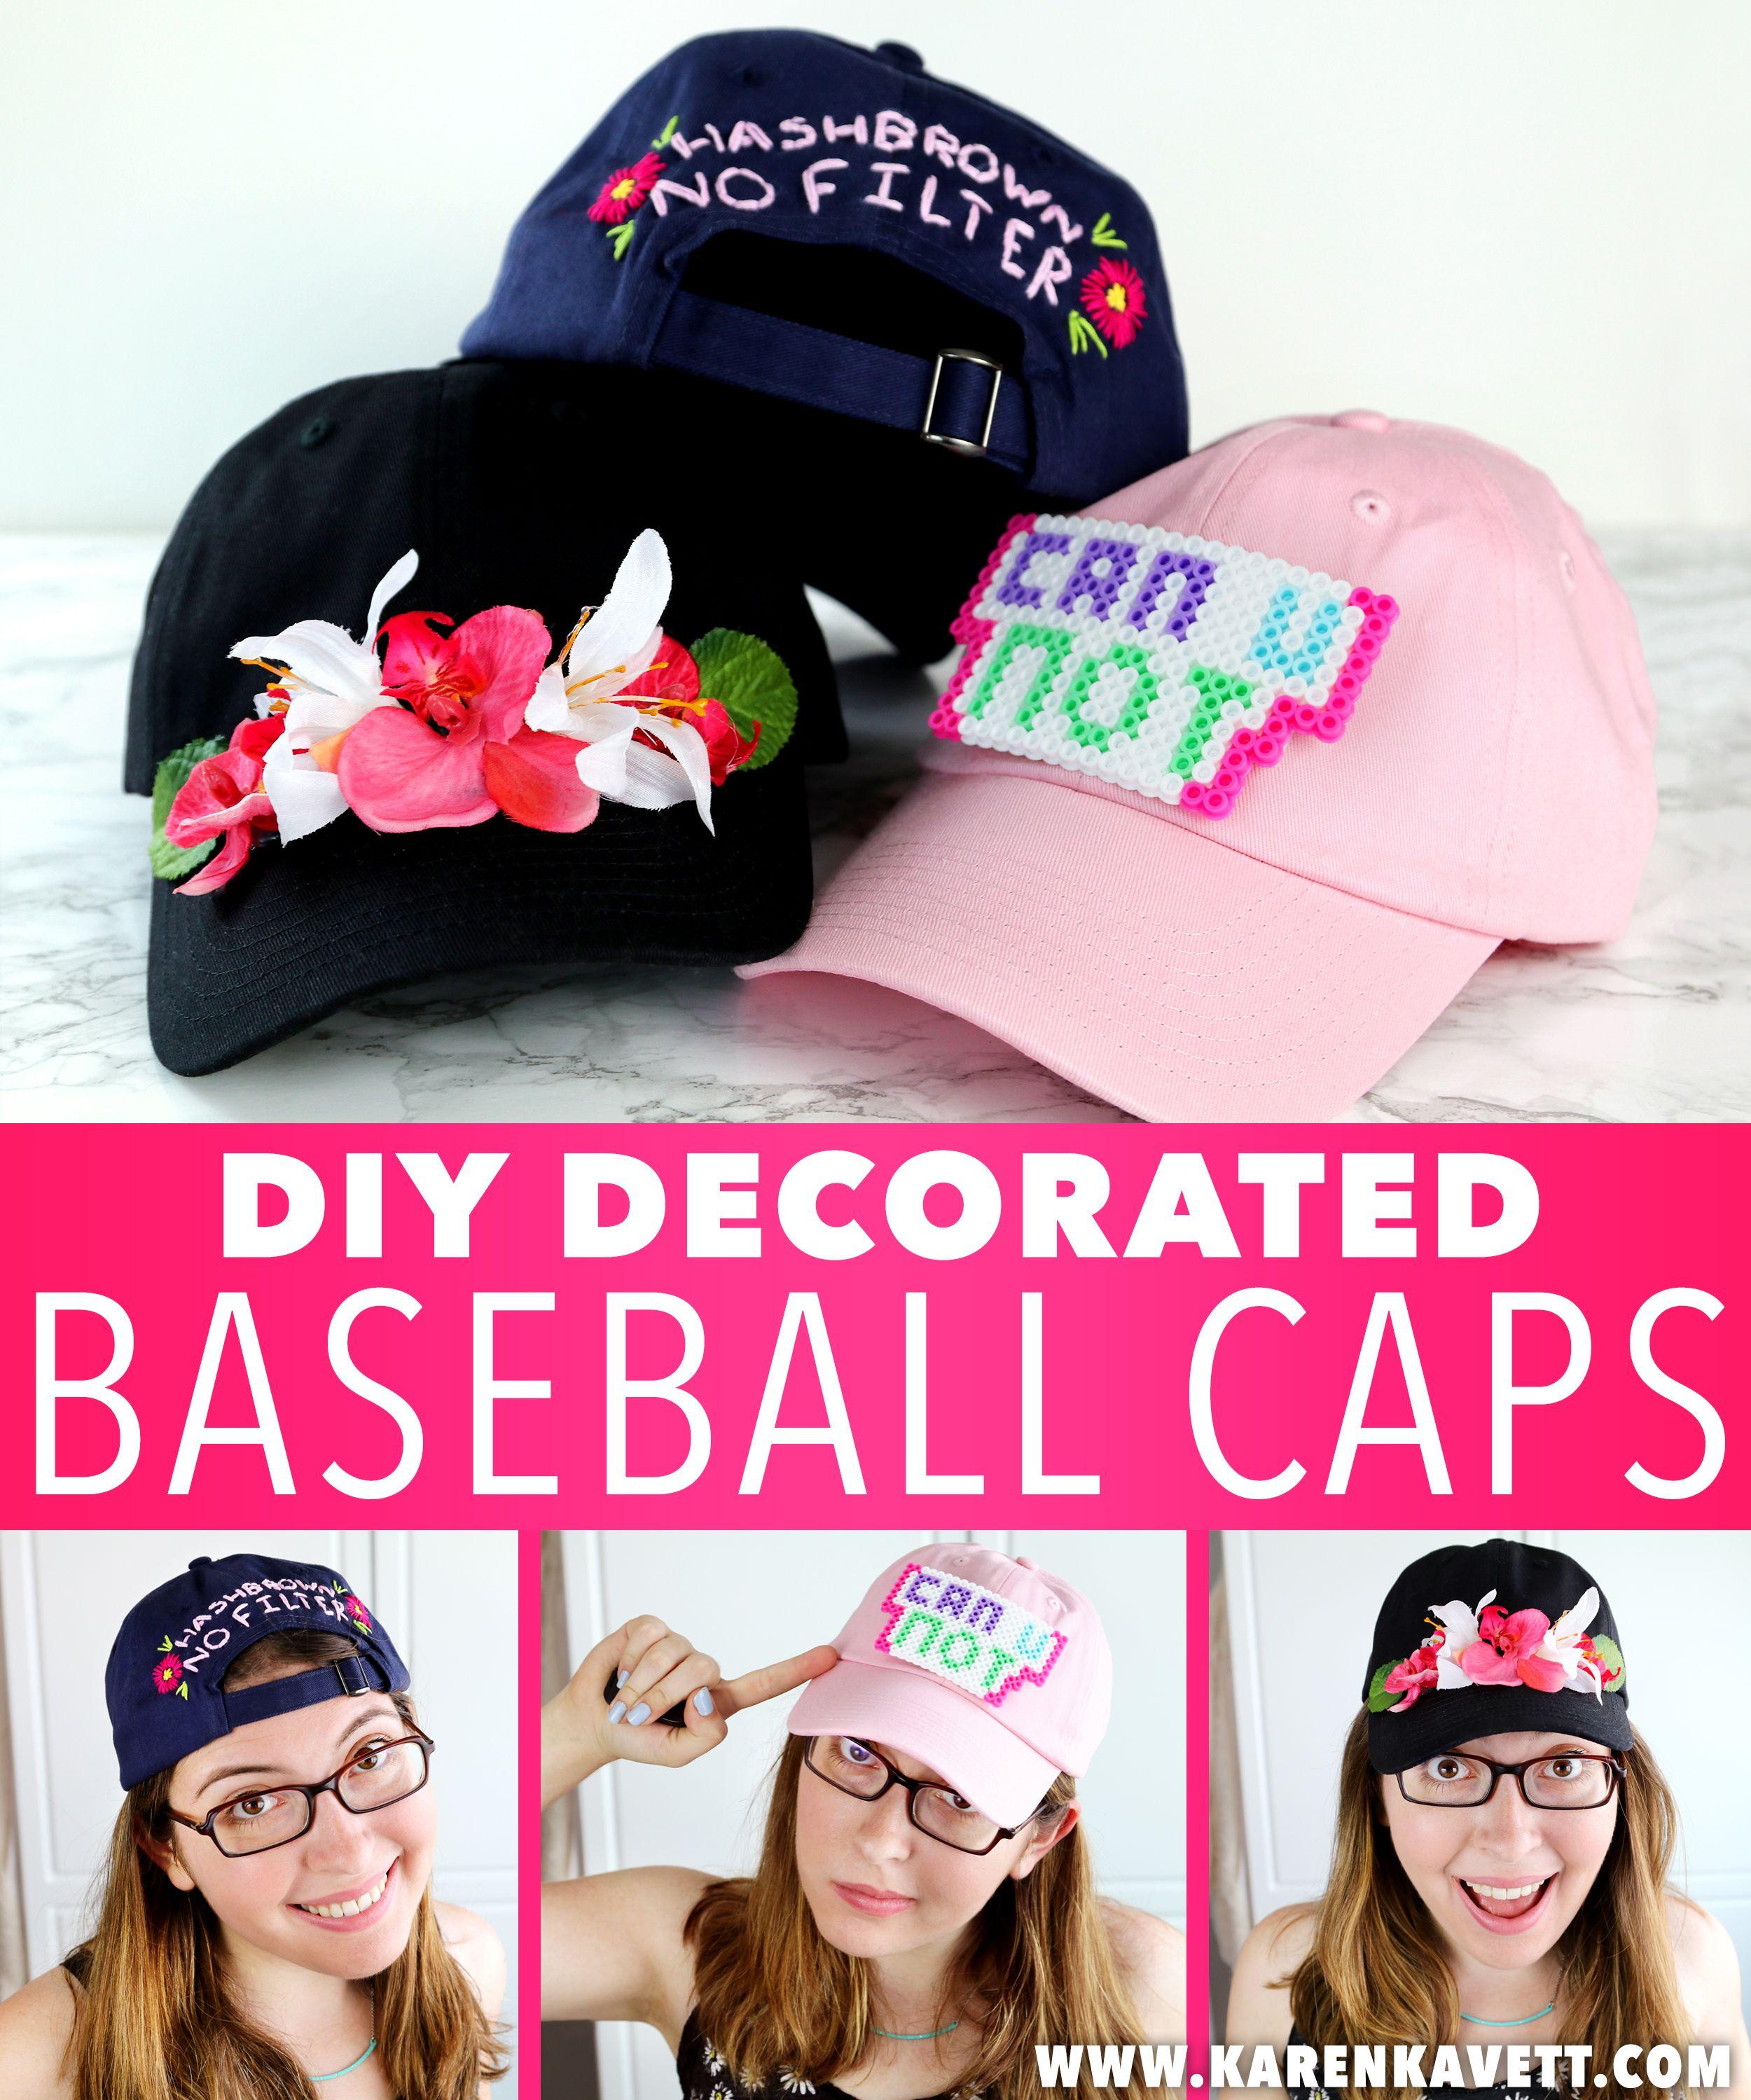 Diy Decorated Baseball Caps 3 Ways Karen Kavett Baseball Hats Monogram Baseball Cap Wall Hats